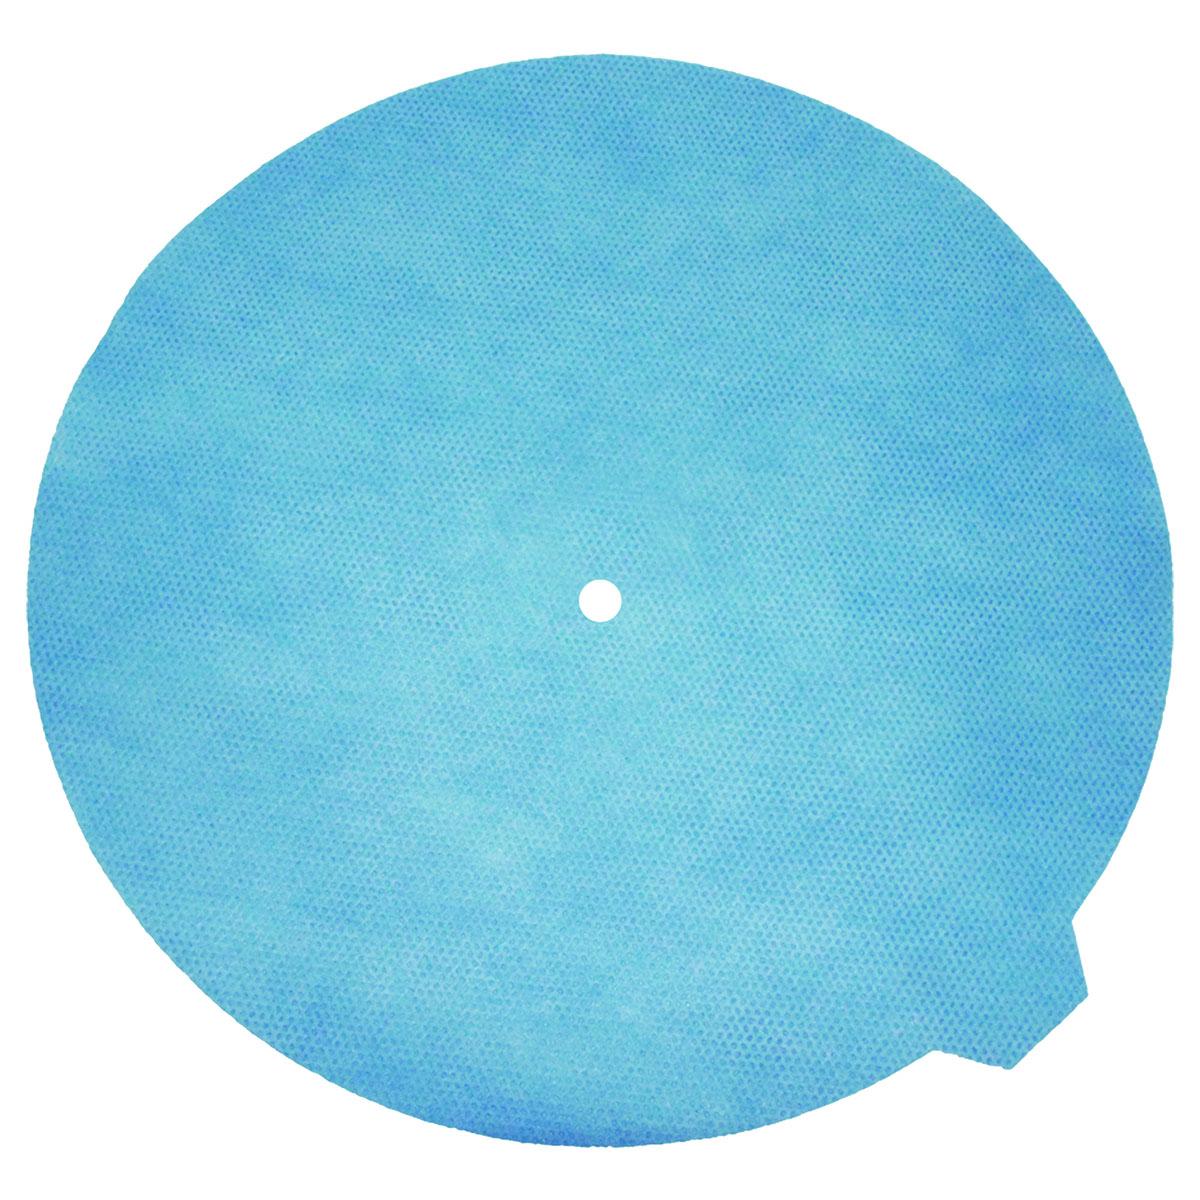 Round Filter Without Indicator Image